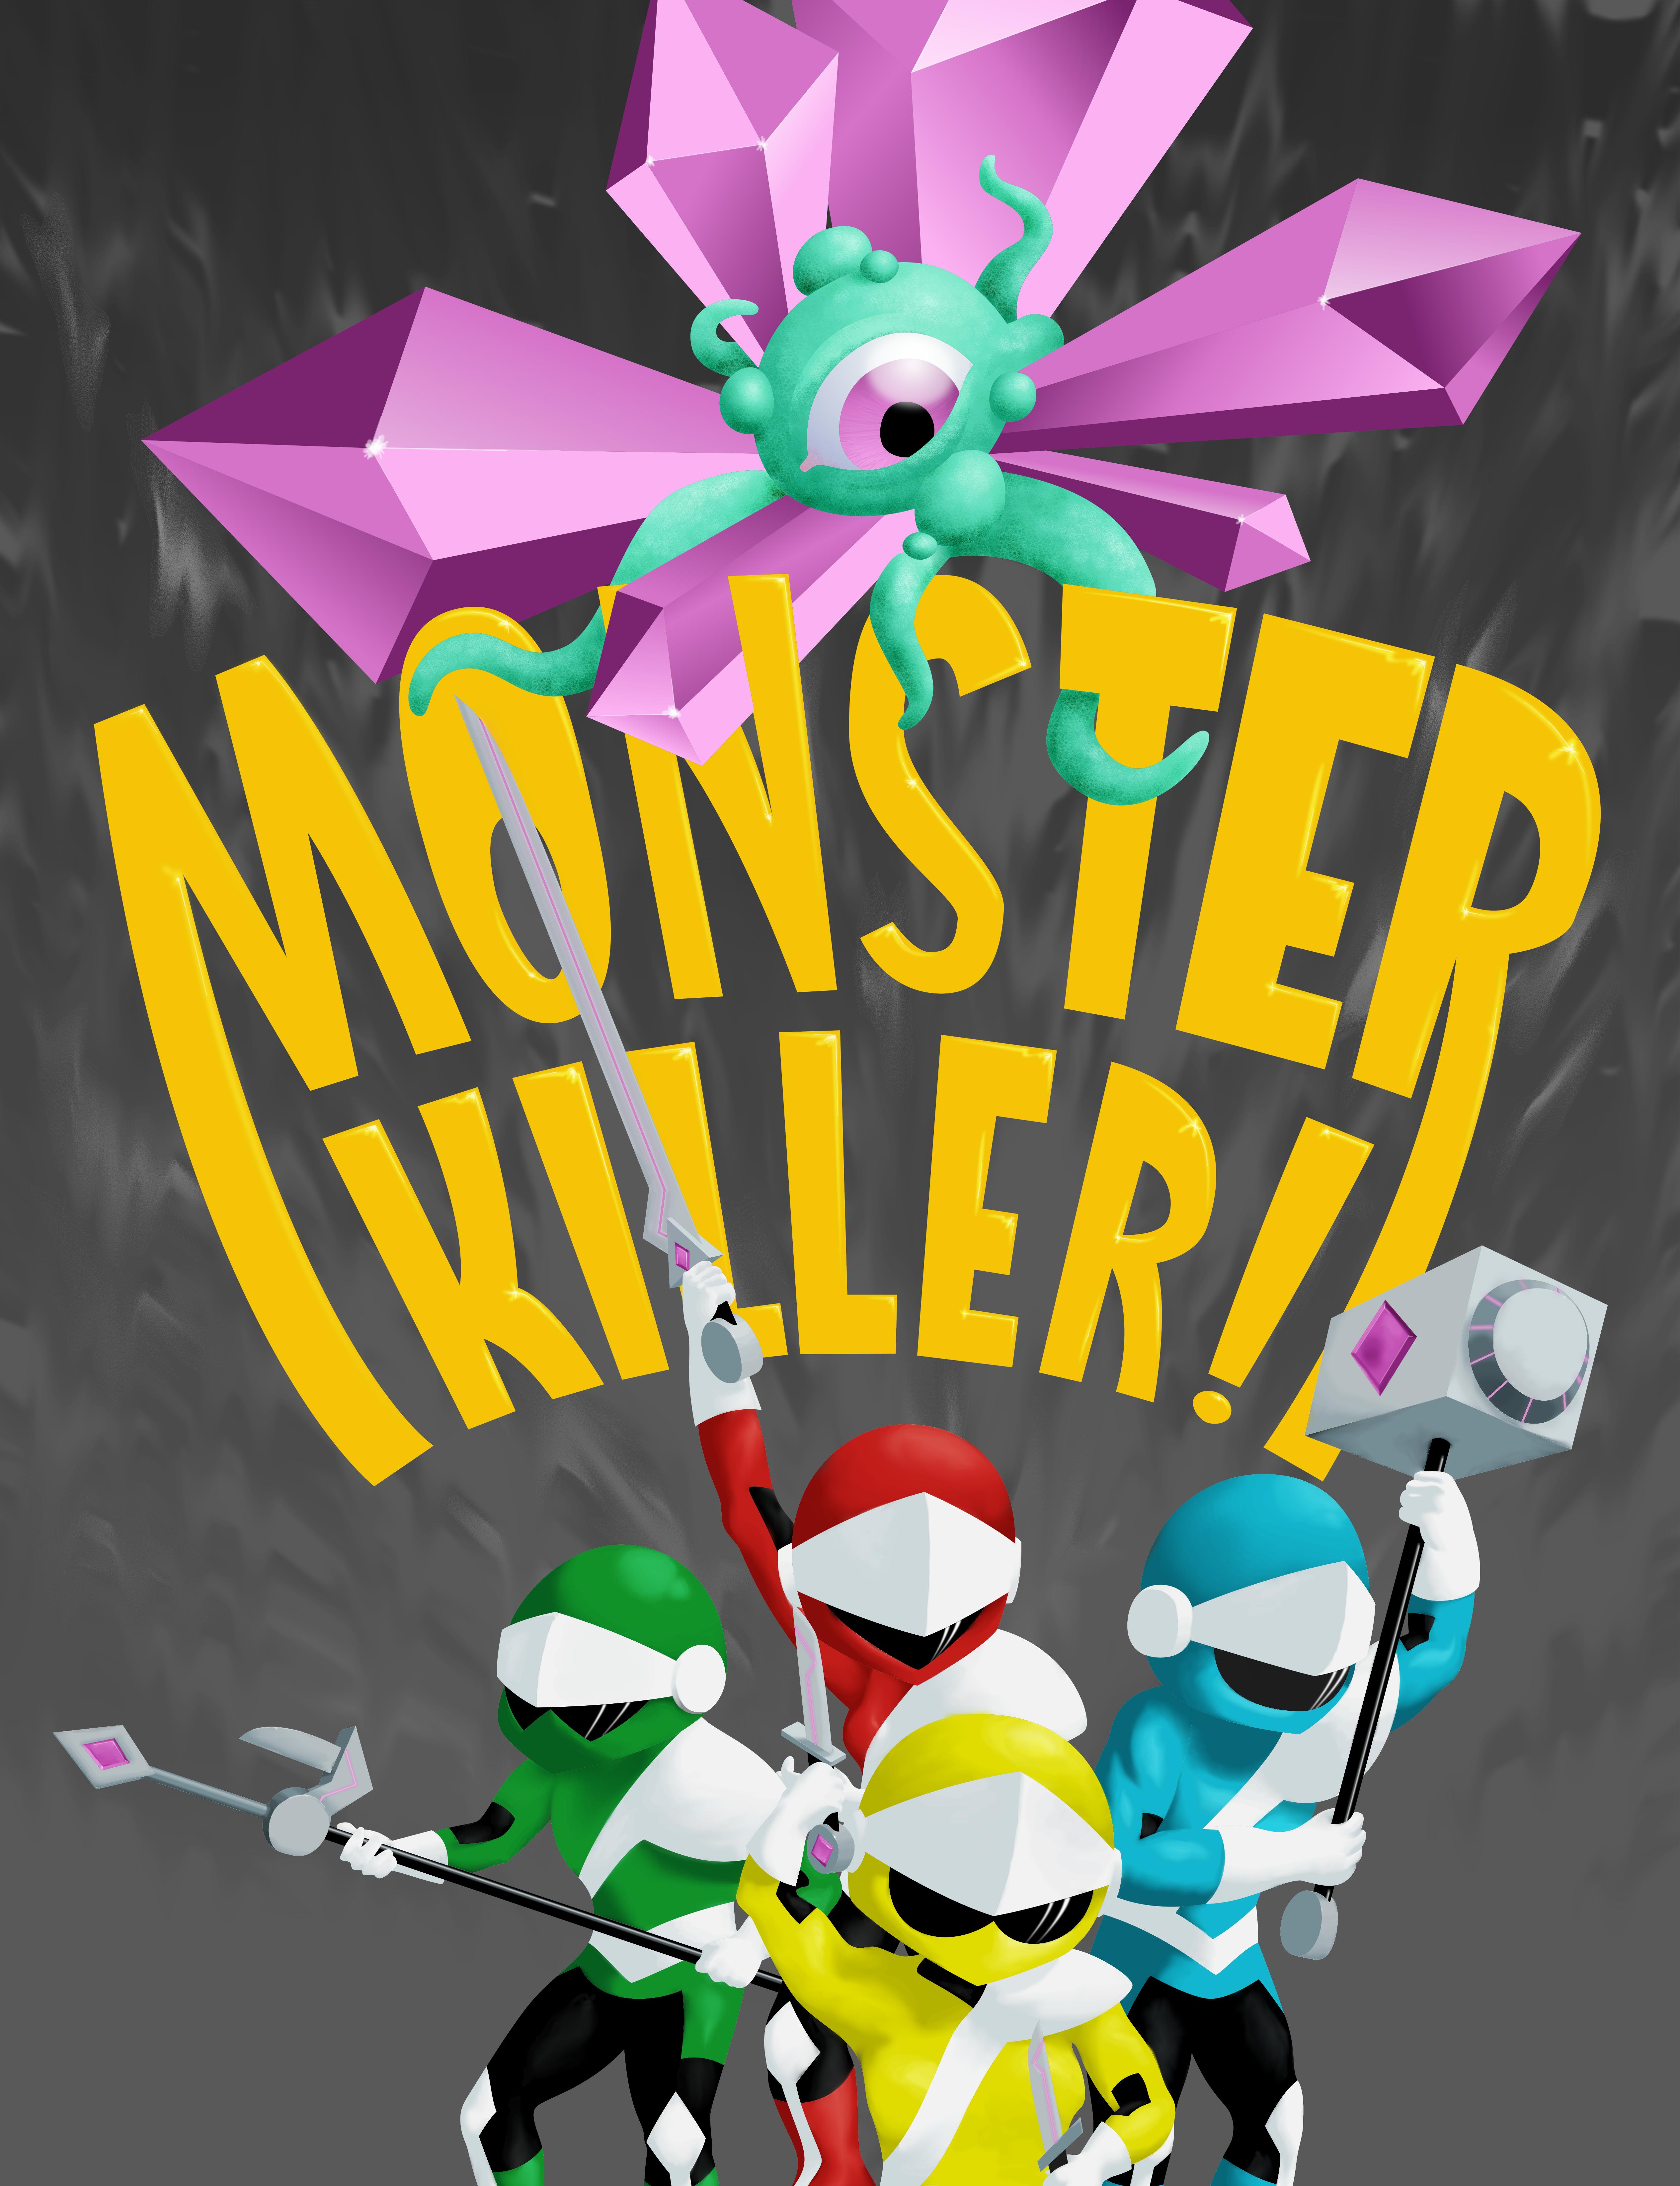 MopnsterKillers6.png